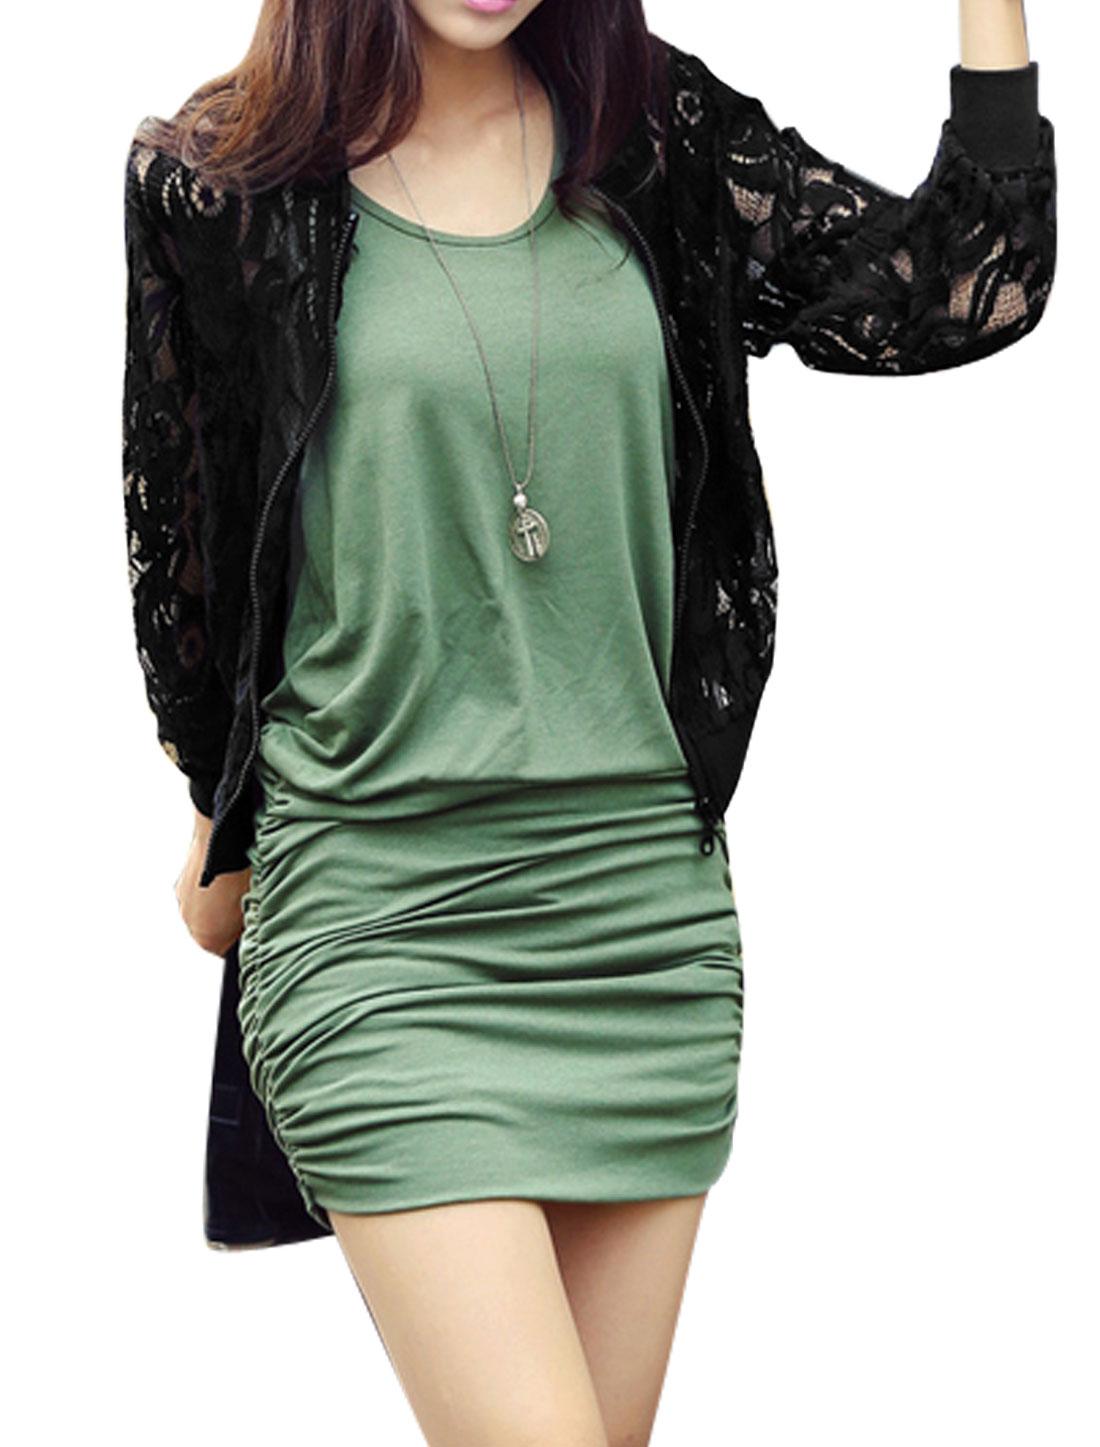 Women Fashion Flower Design Ribbed Trim Zipper Front Lace Jacket Black S